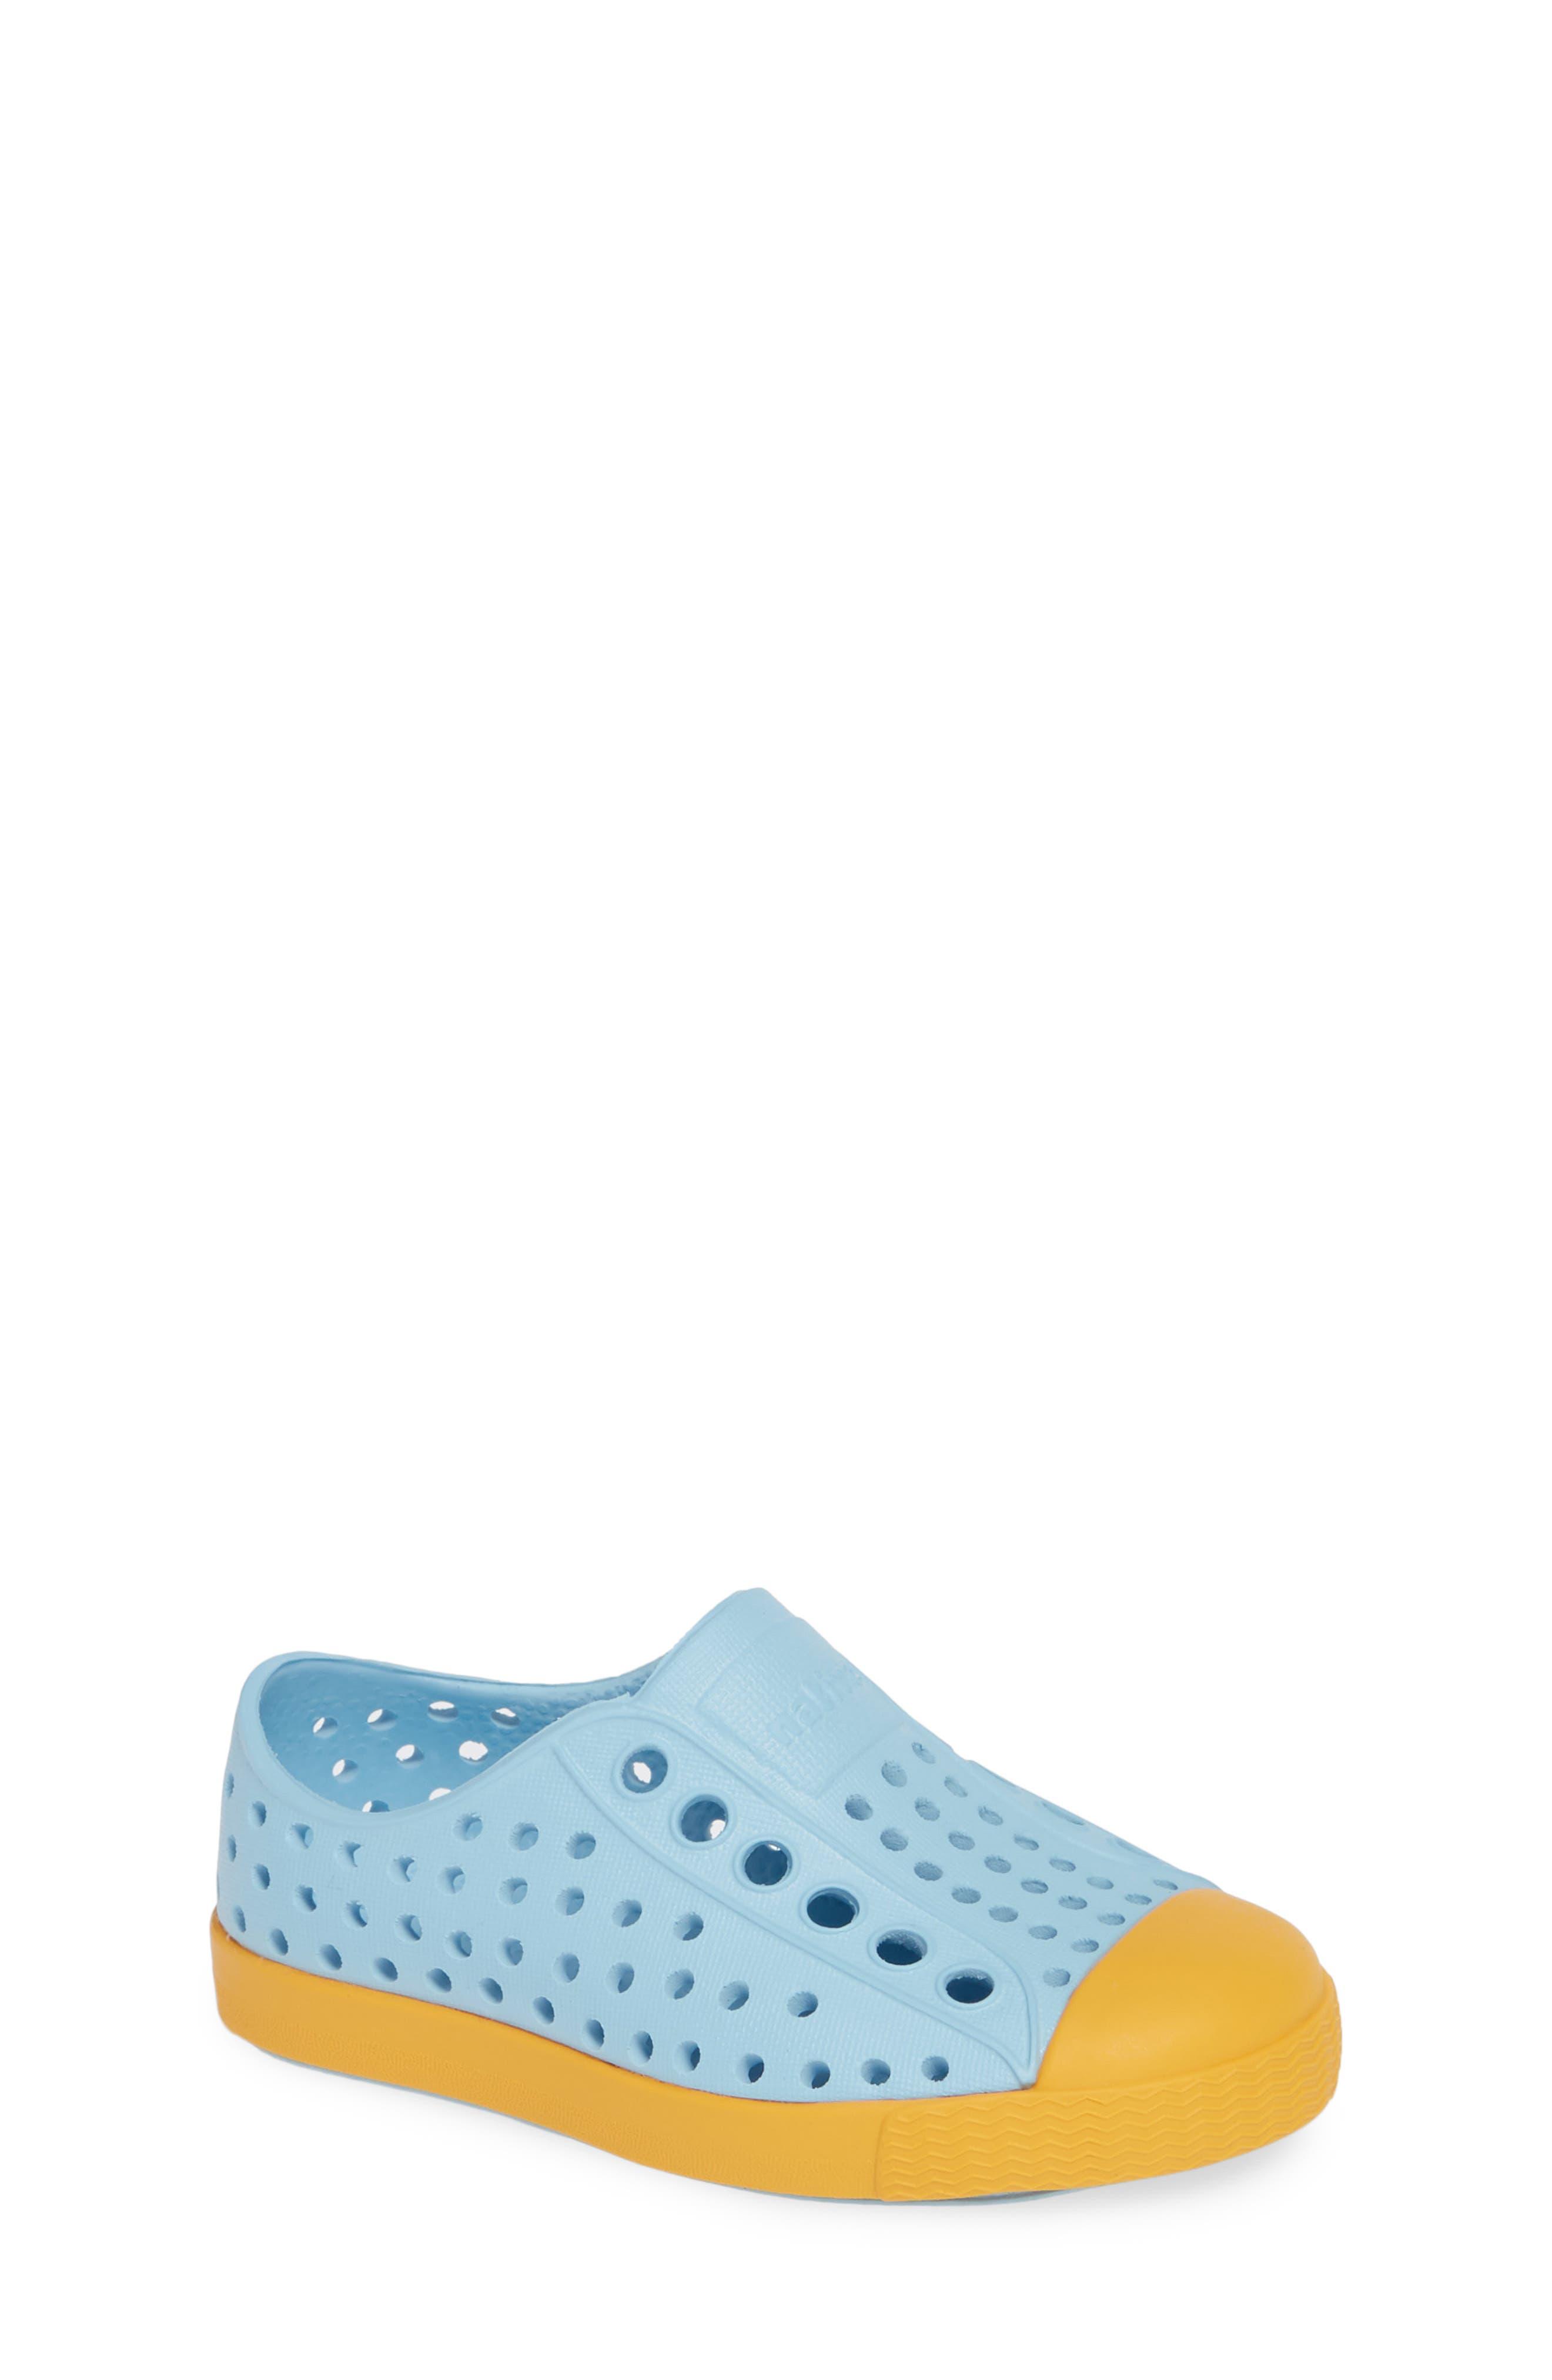 'Jefferson' Water Friendly Slip-On Sneaker,                             Main thumbnail 21, color,